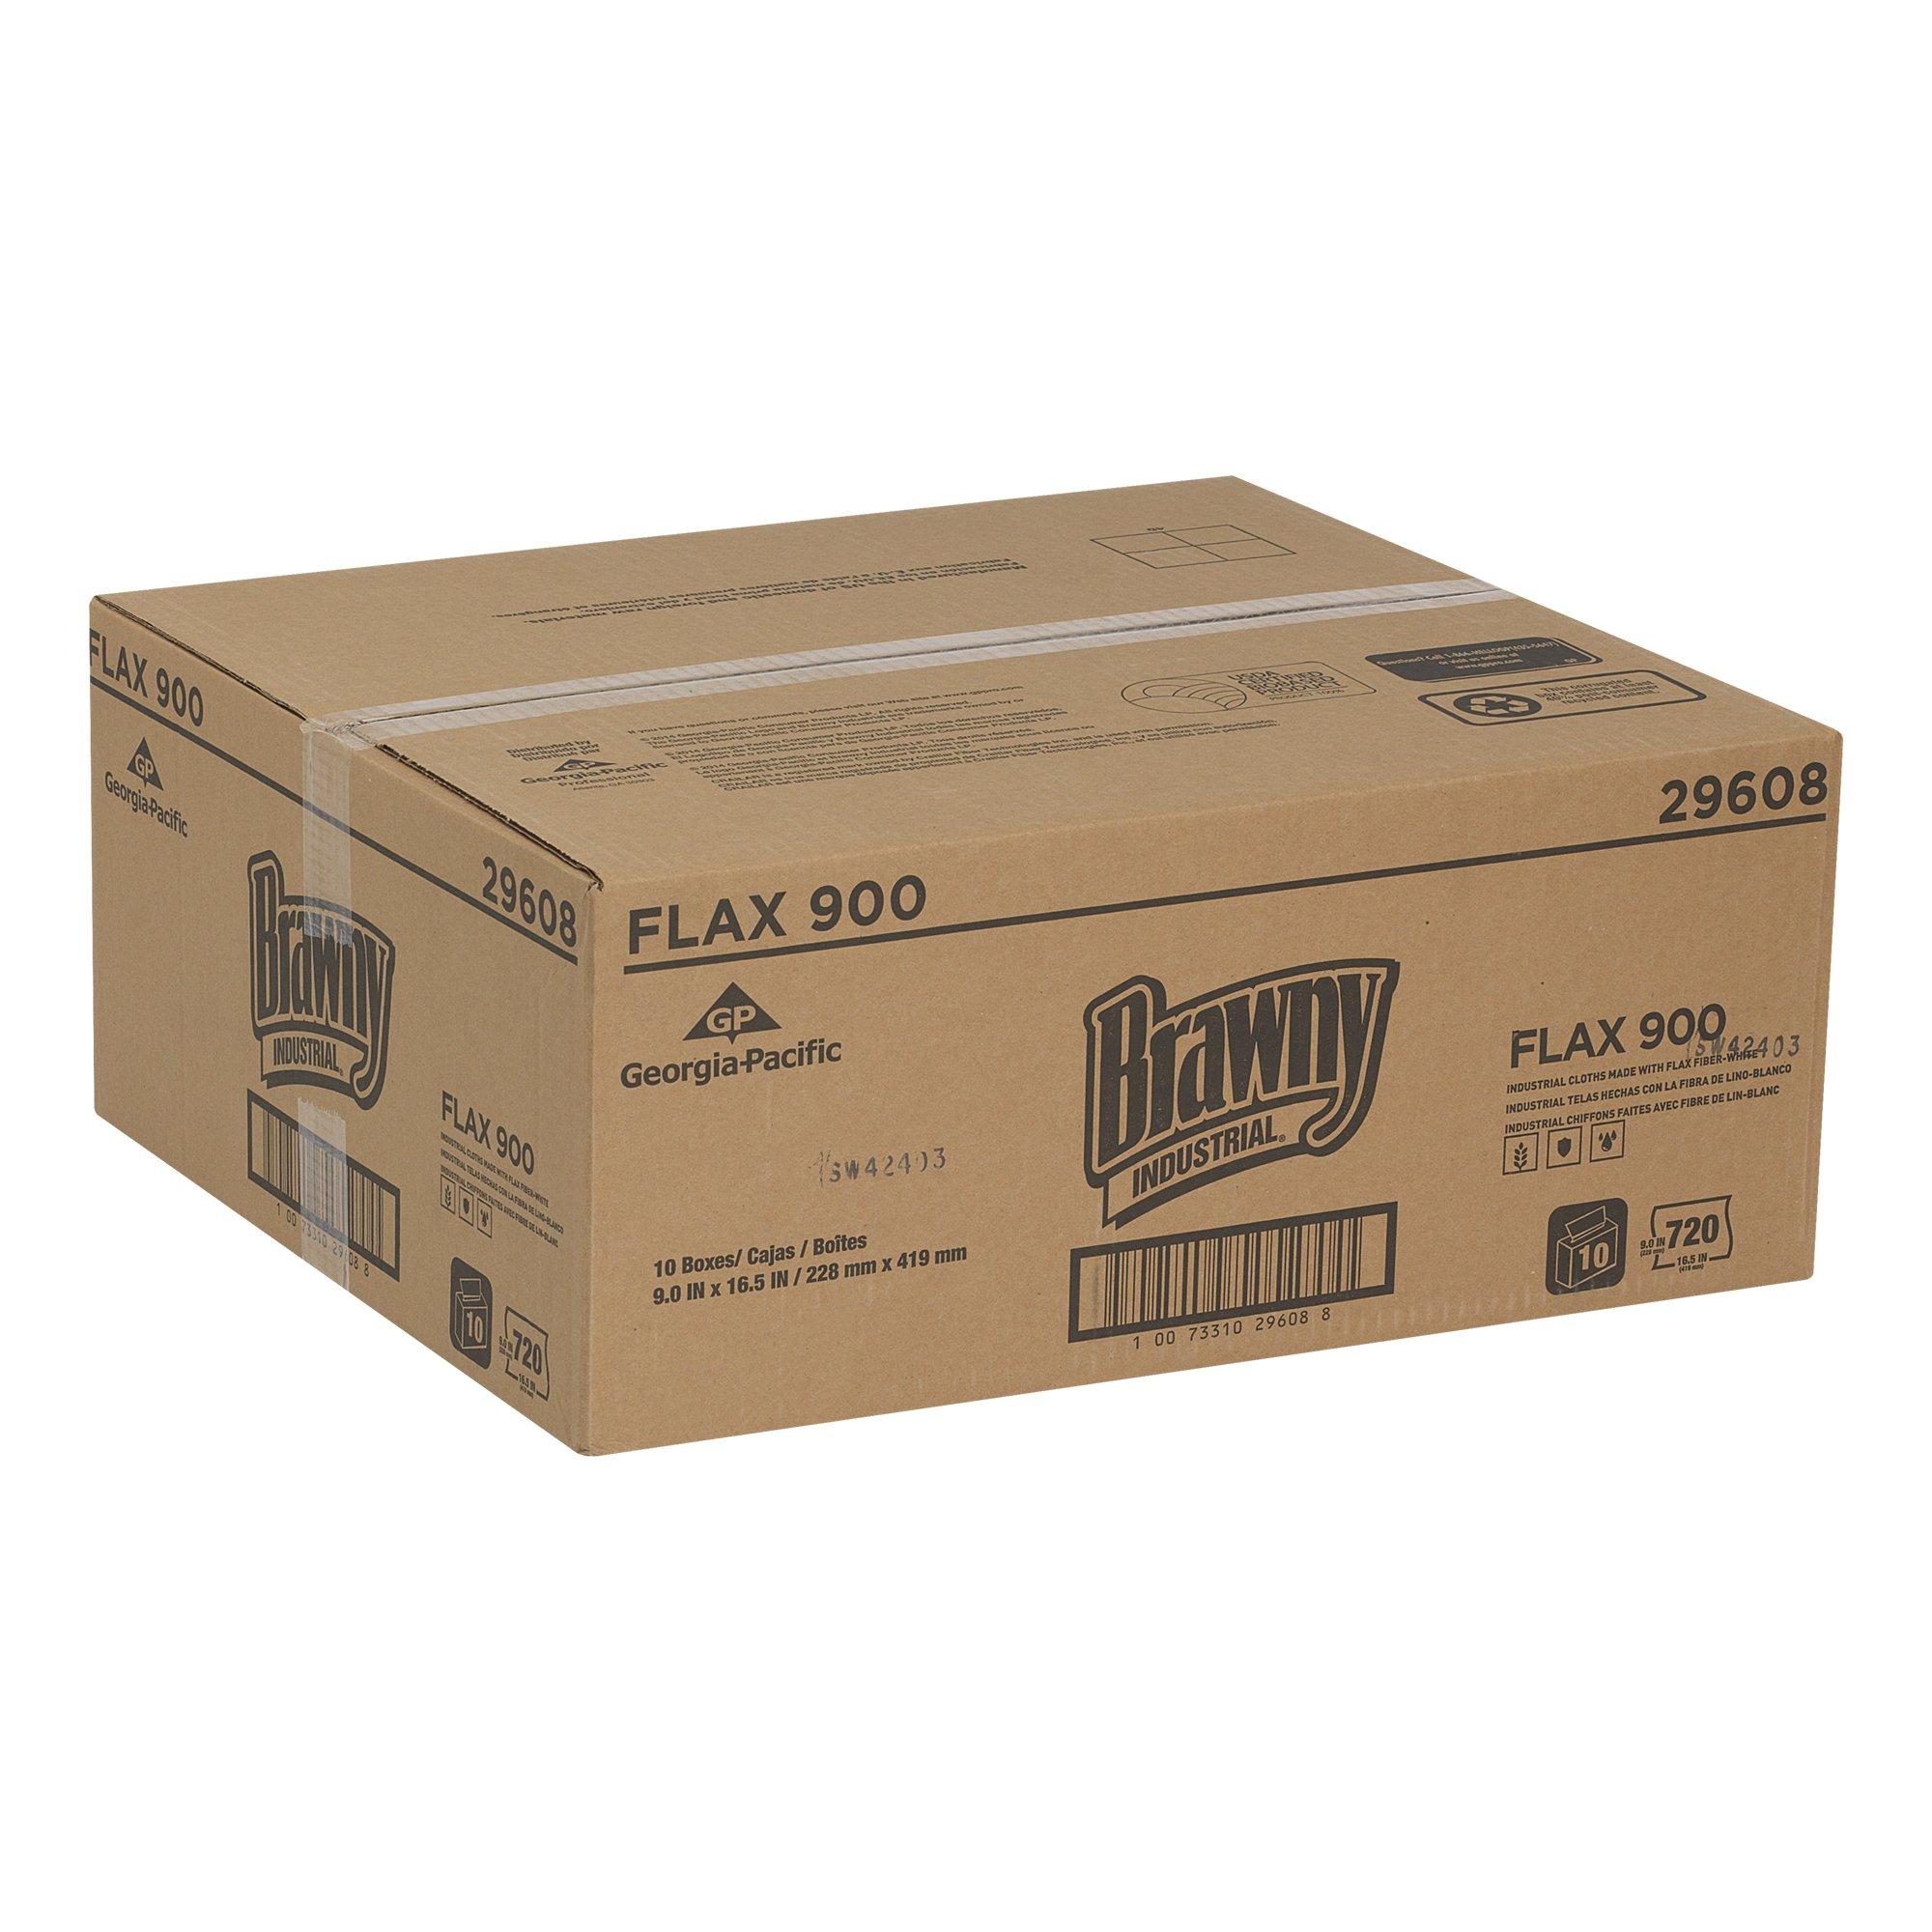 Brawny Industrial 29608 FLAX 900 Heavy Duty Cloths (10 Packs of 72)